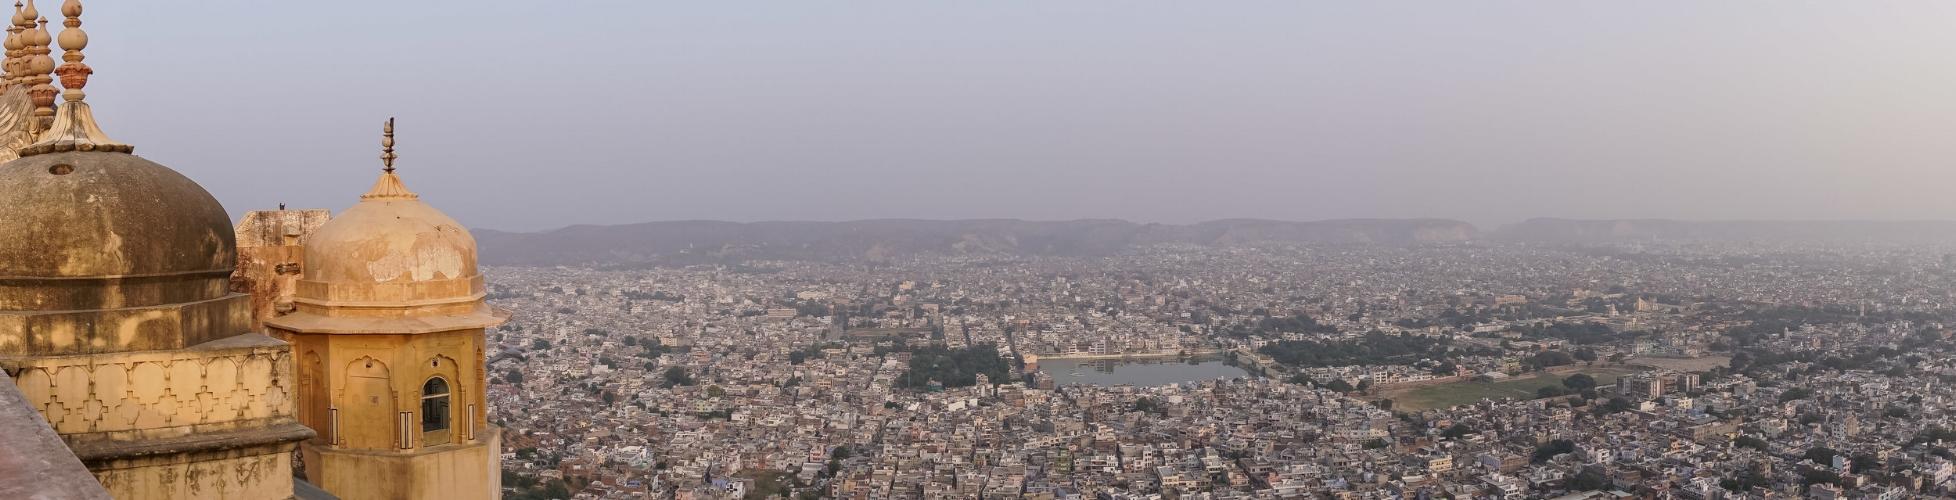 curio.trips.india.jaipur.rooftop.view-2.jpg